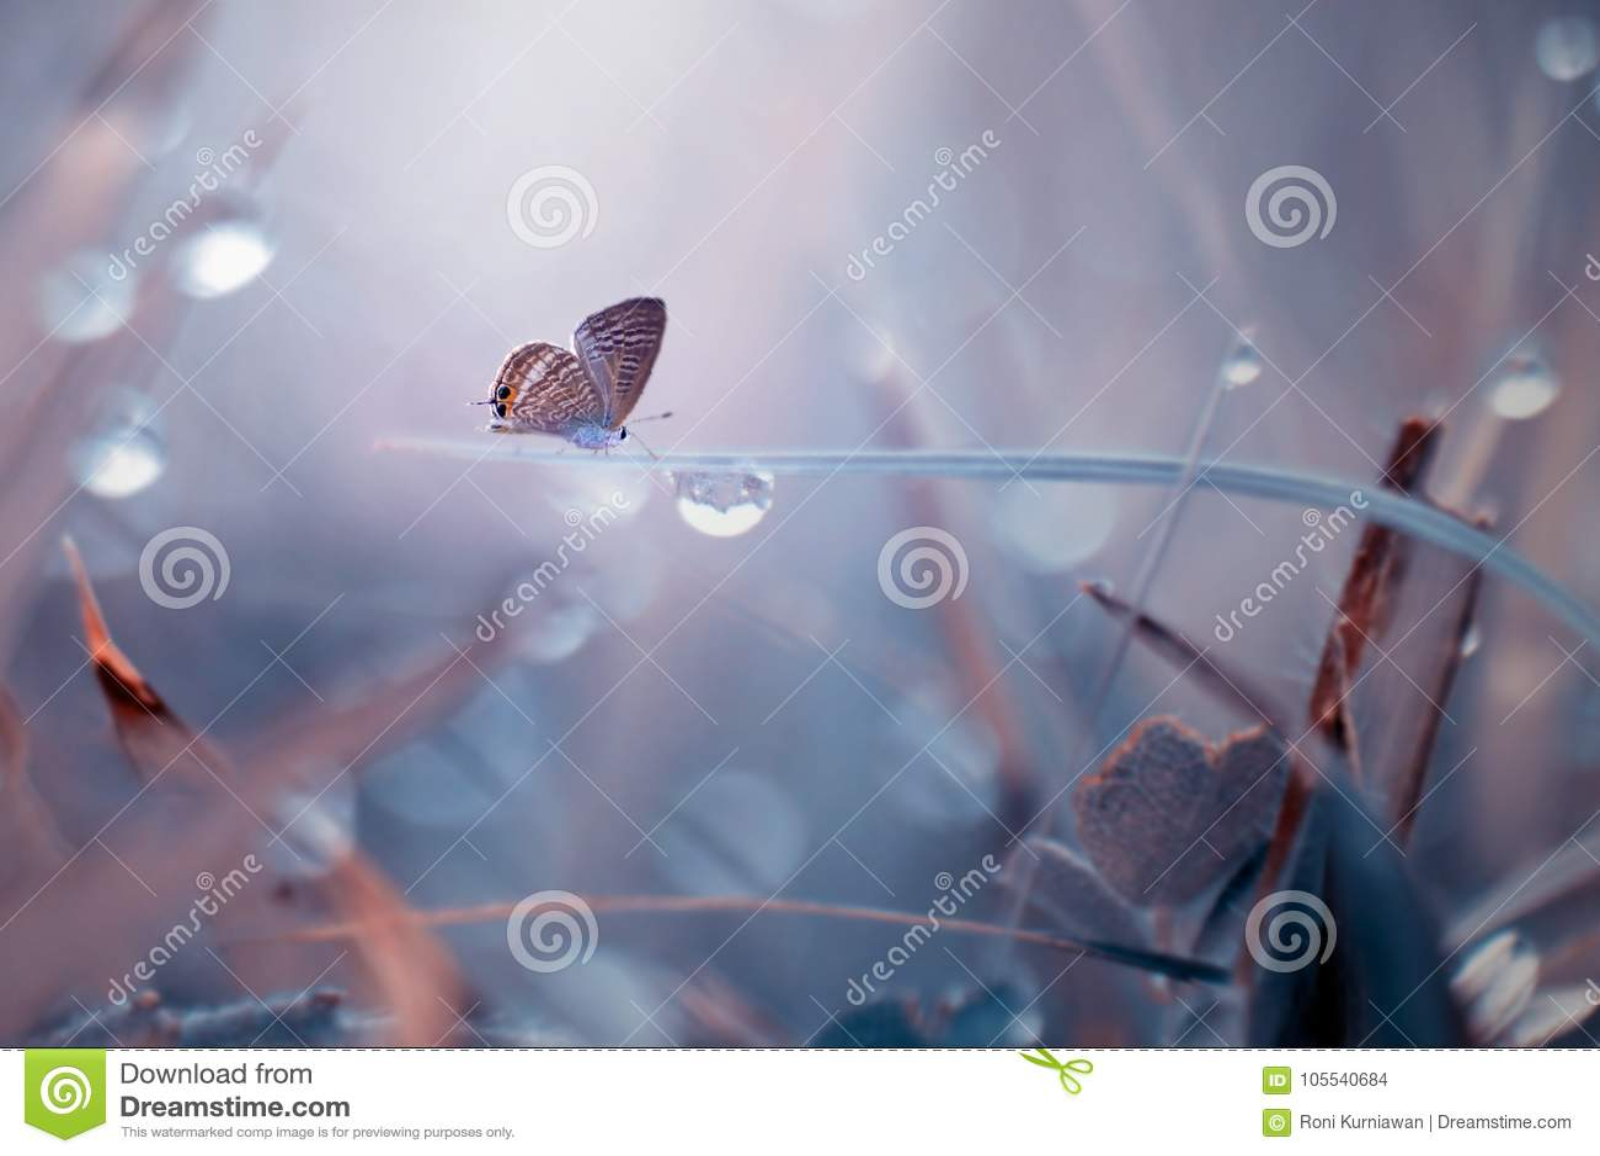 Borboleta, animais, macro, bokeh, inseto, natureza,